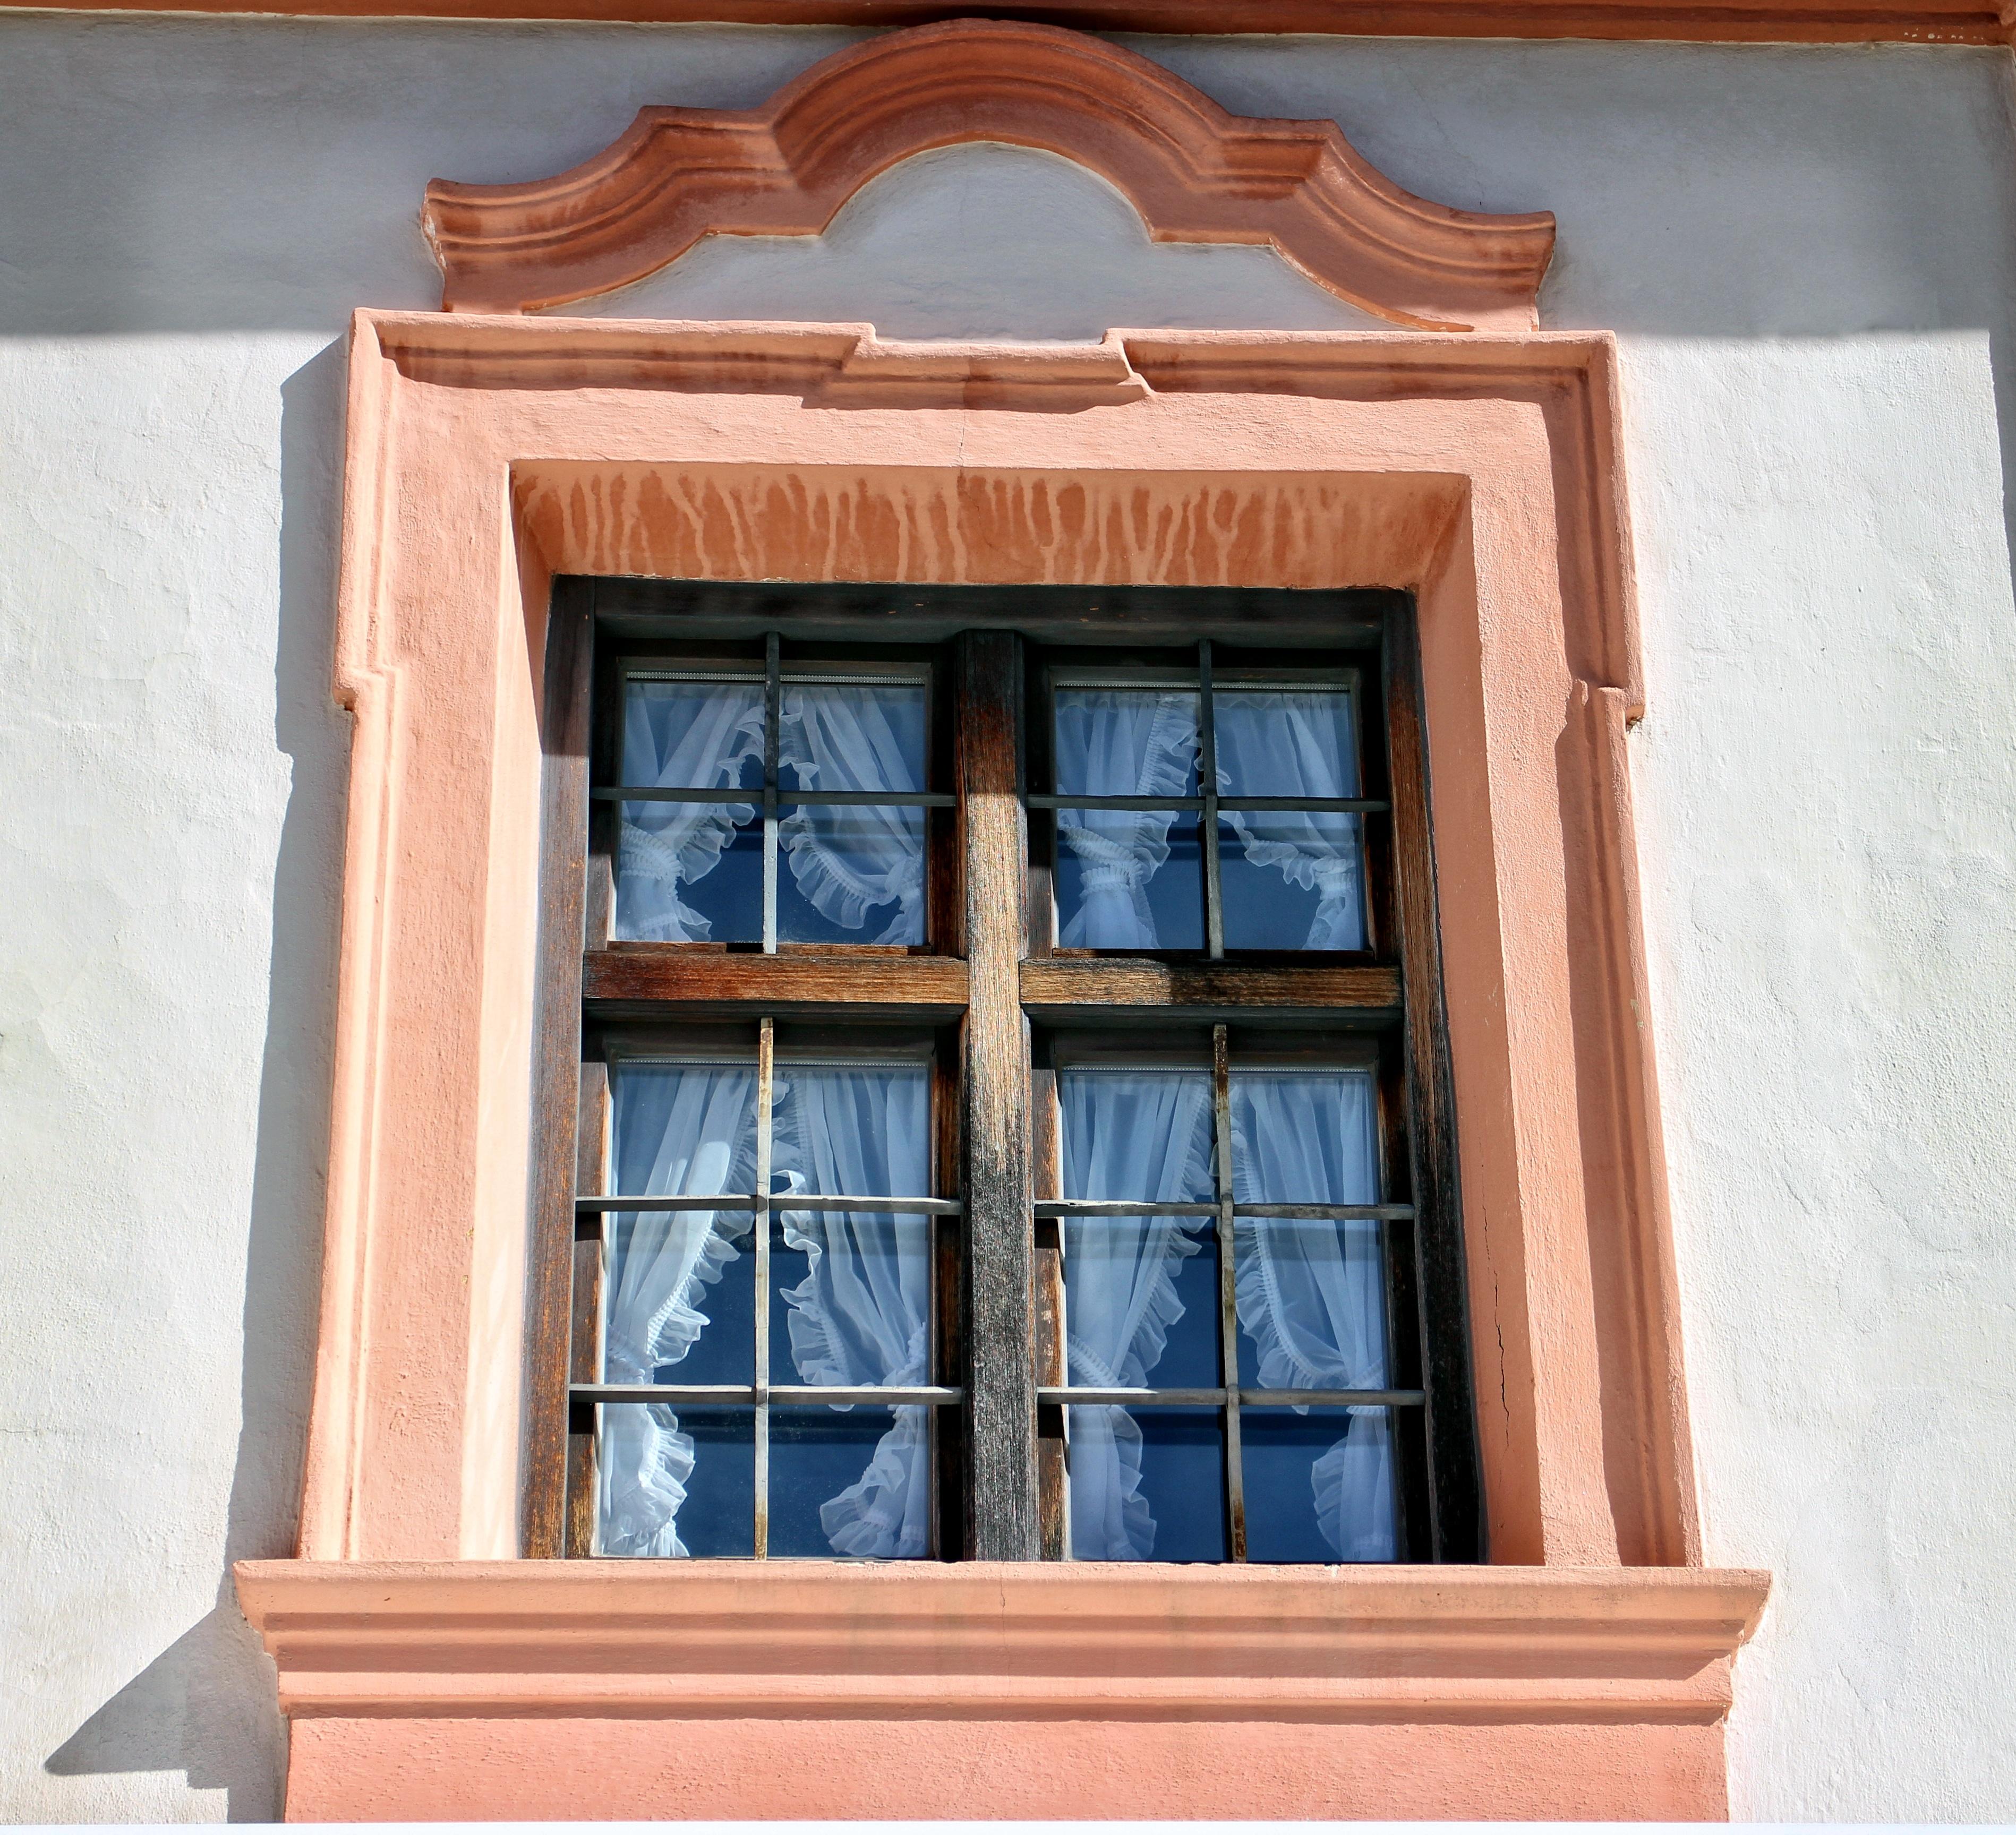 Fotos gratis : arquitectura, madera, antiguo, casa, edificio, pared ...